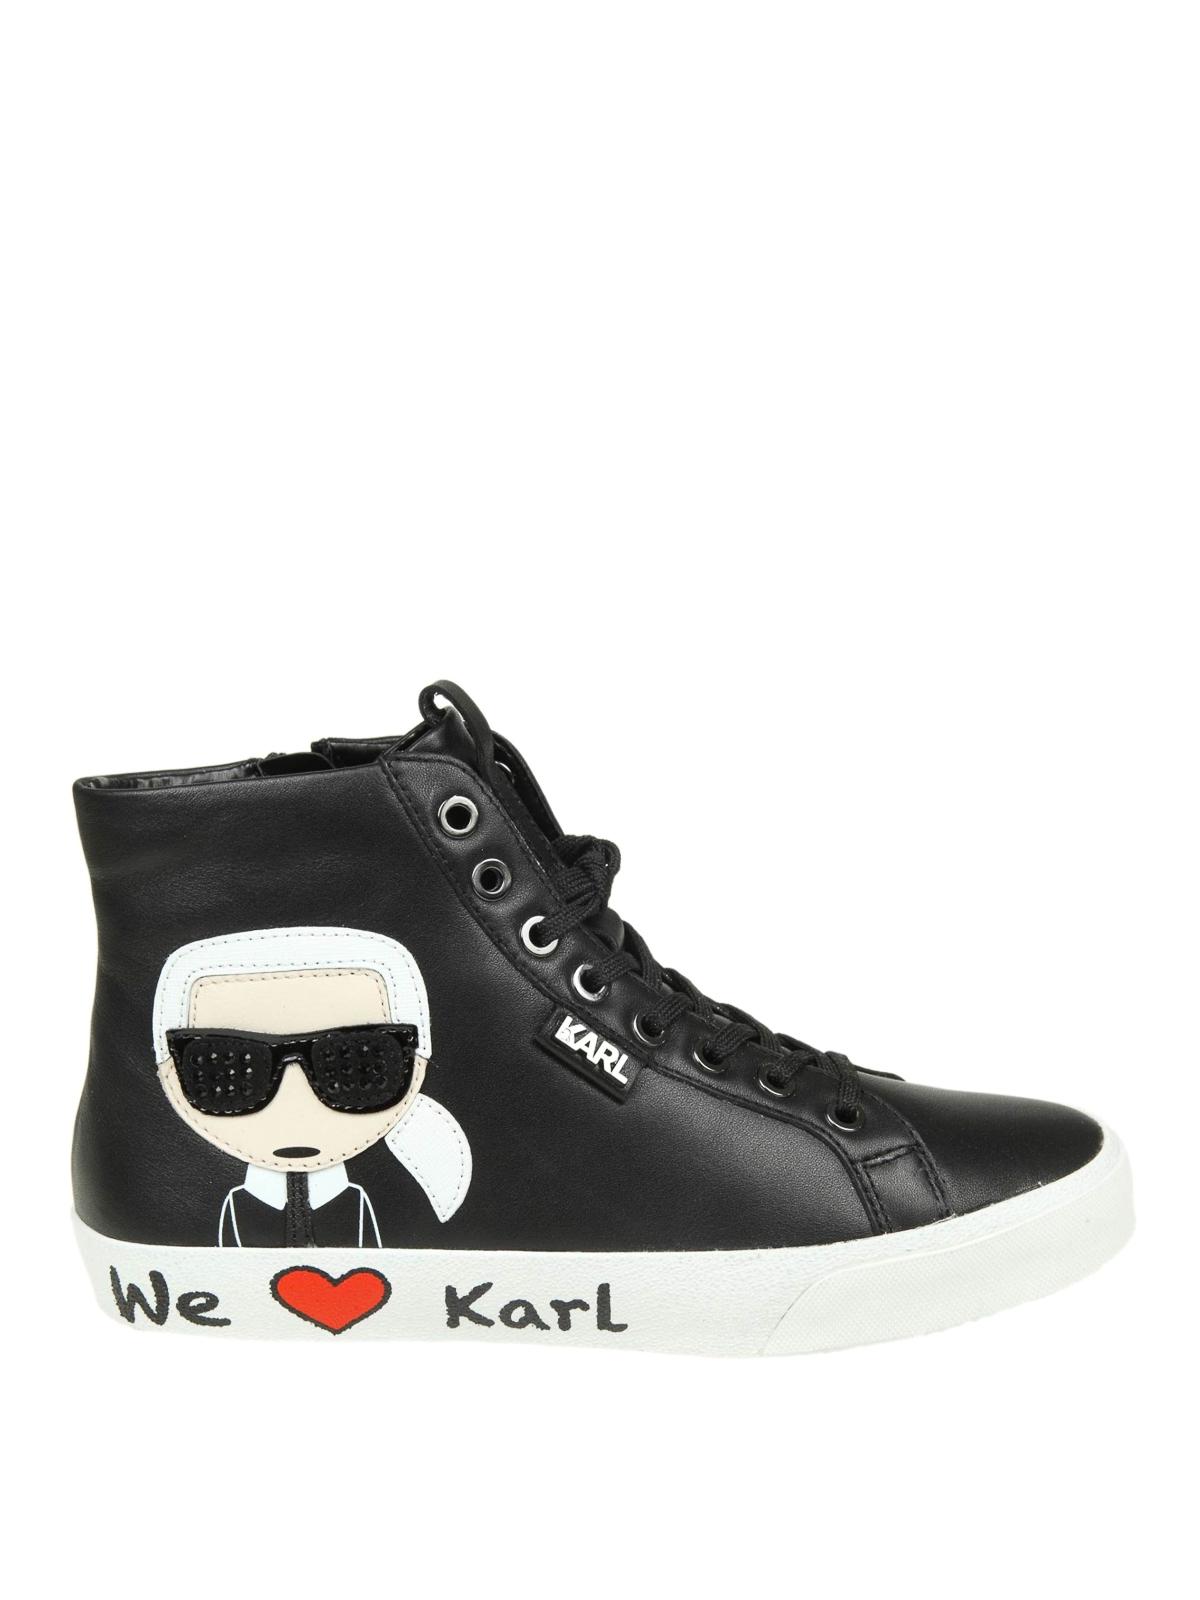 Karl Lagerfeld - Karl patch detail